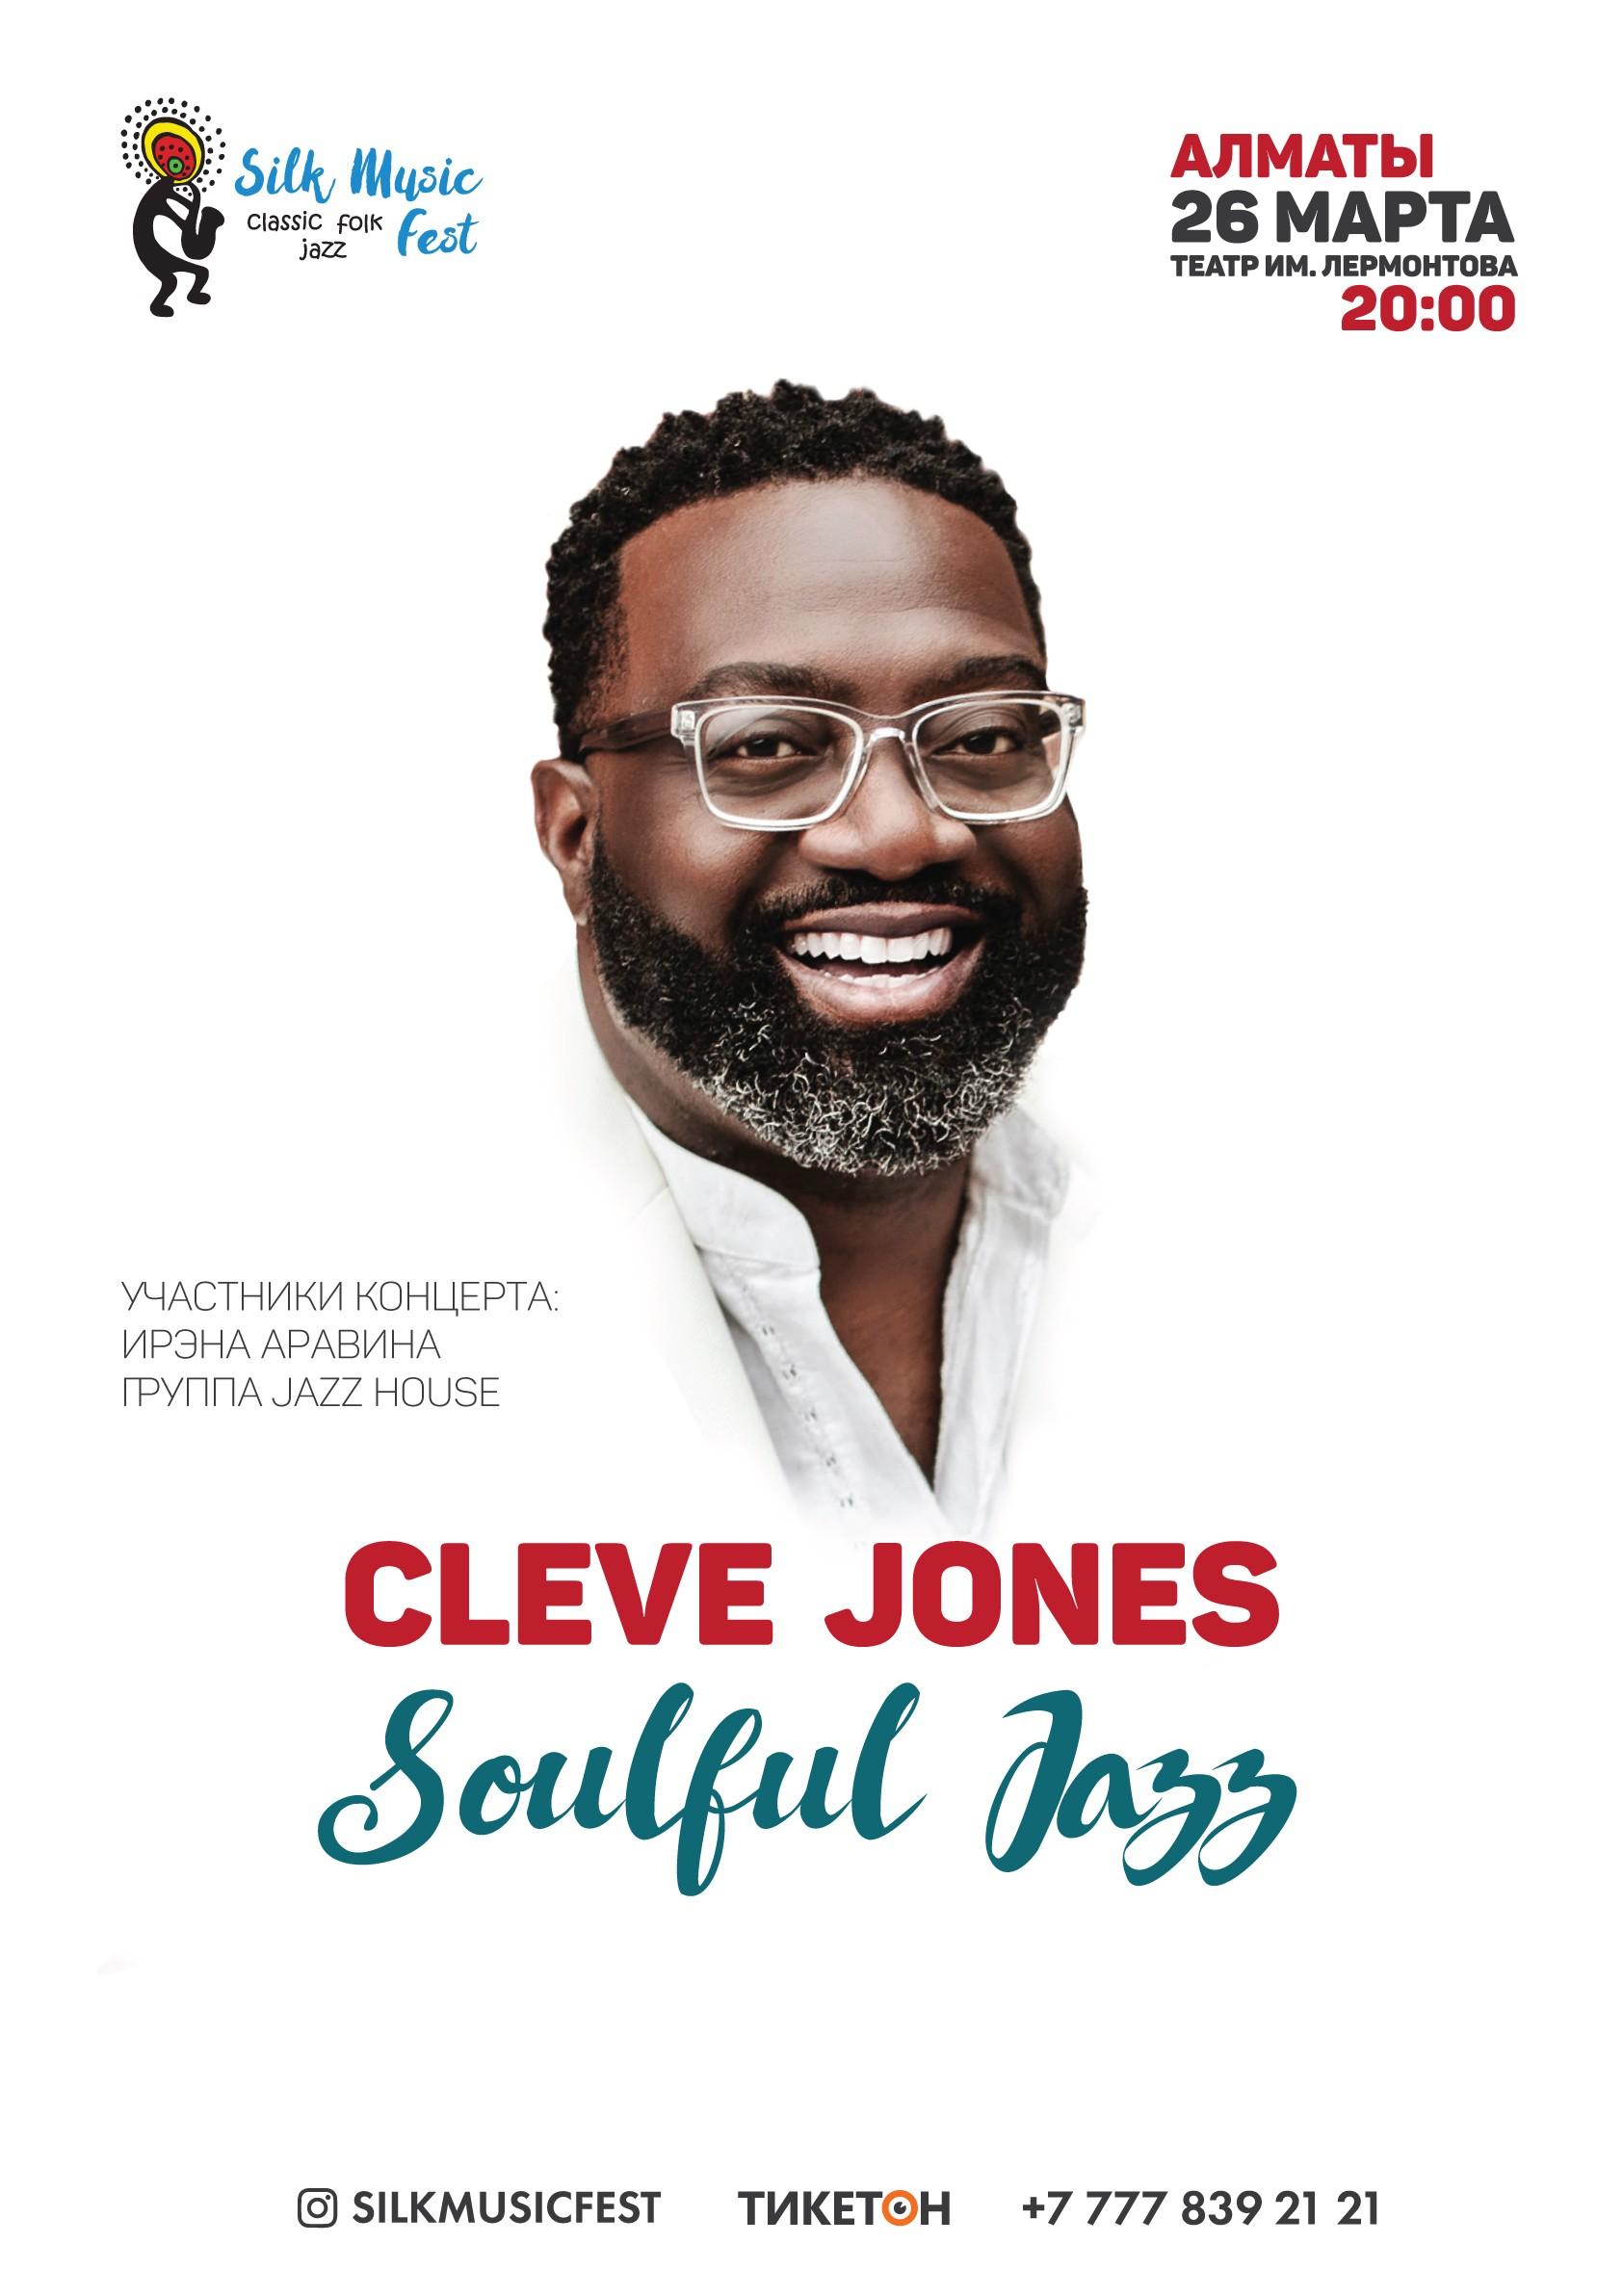 Cleve Jones - «Soulful Jazz»